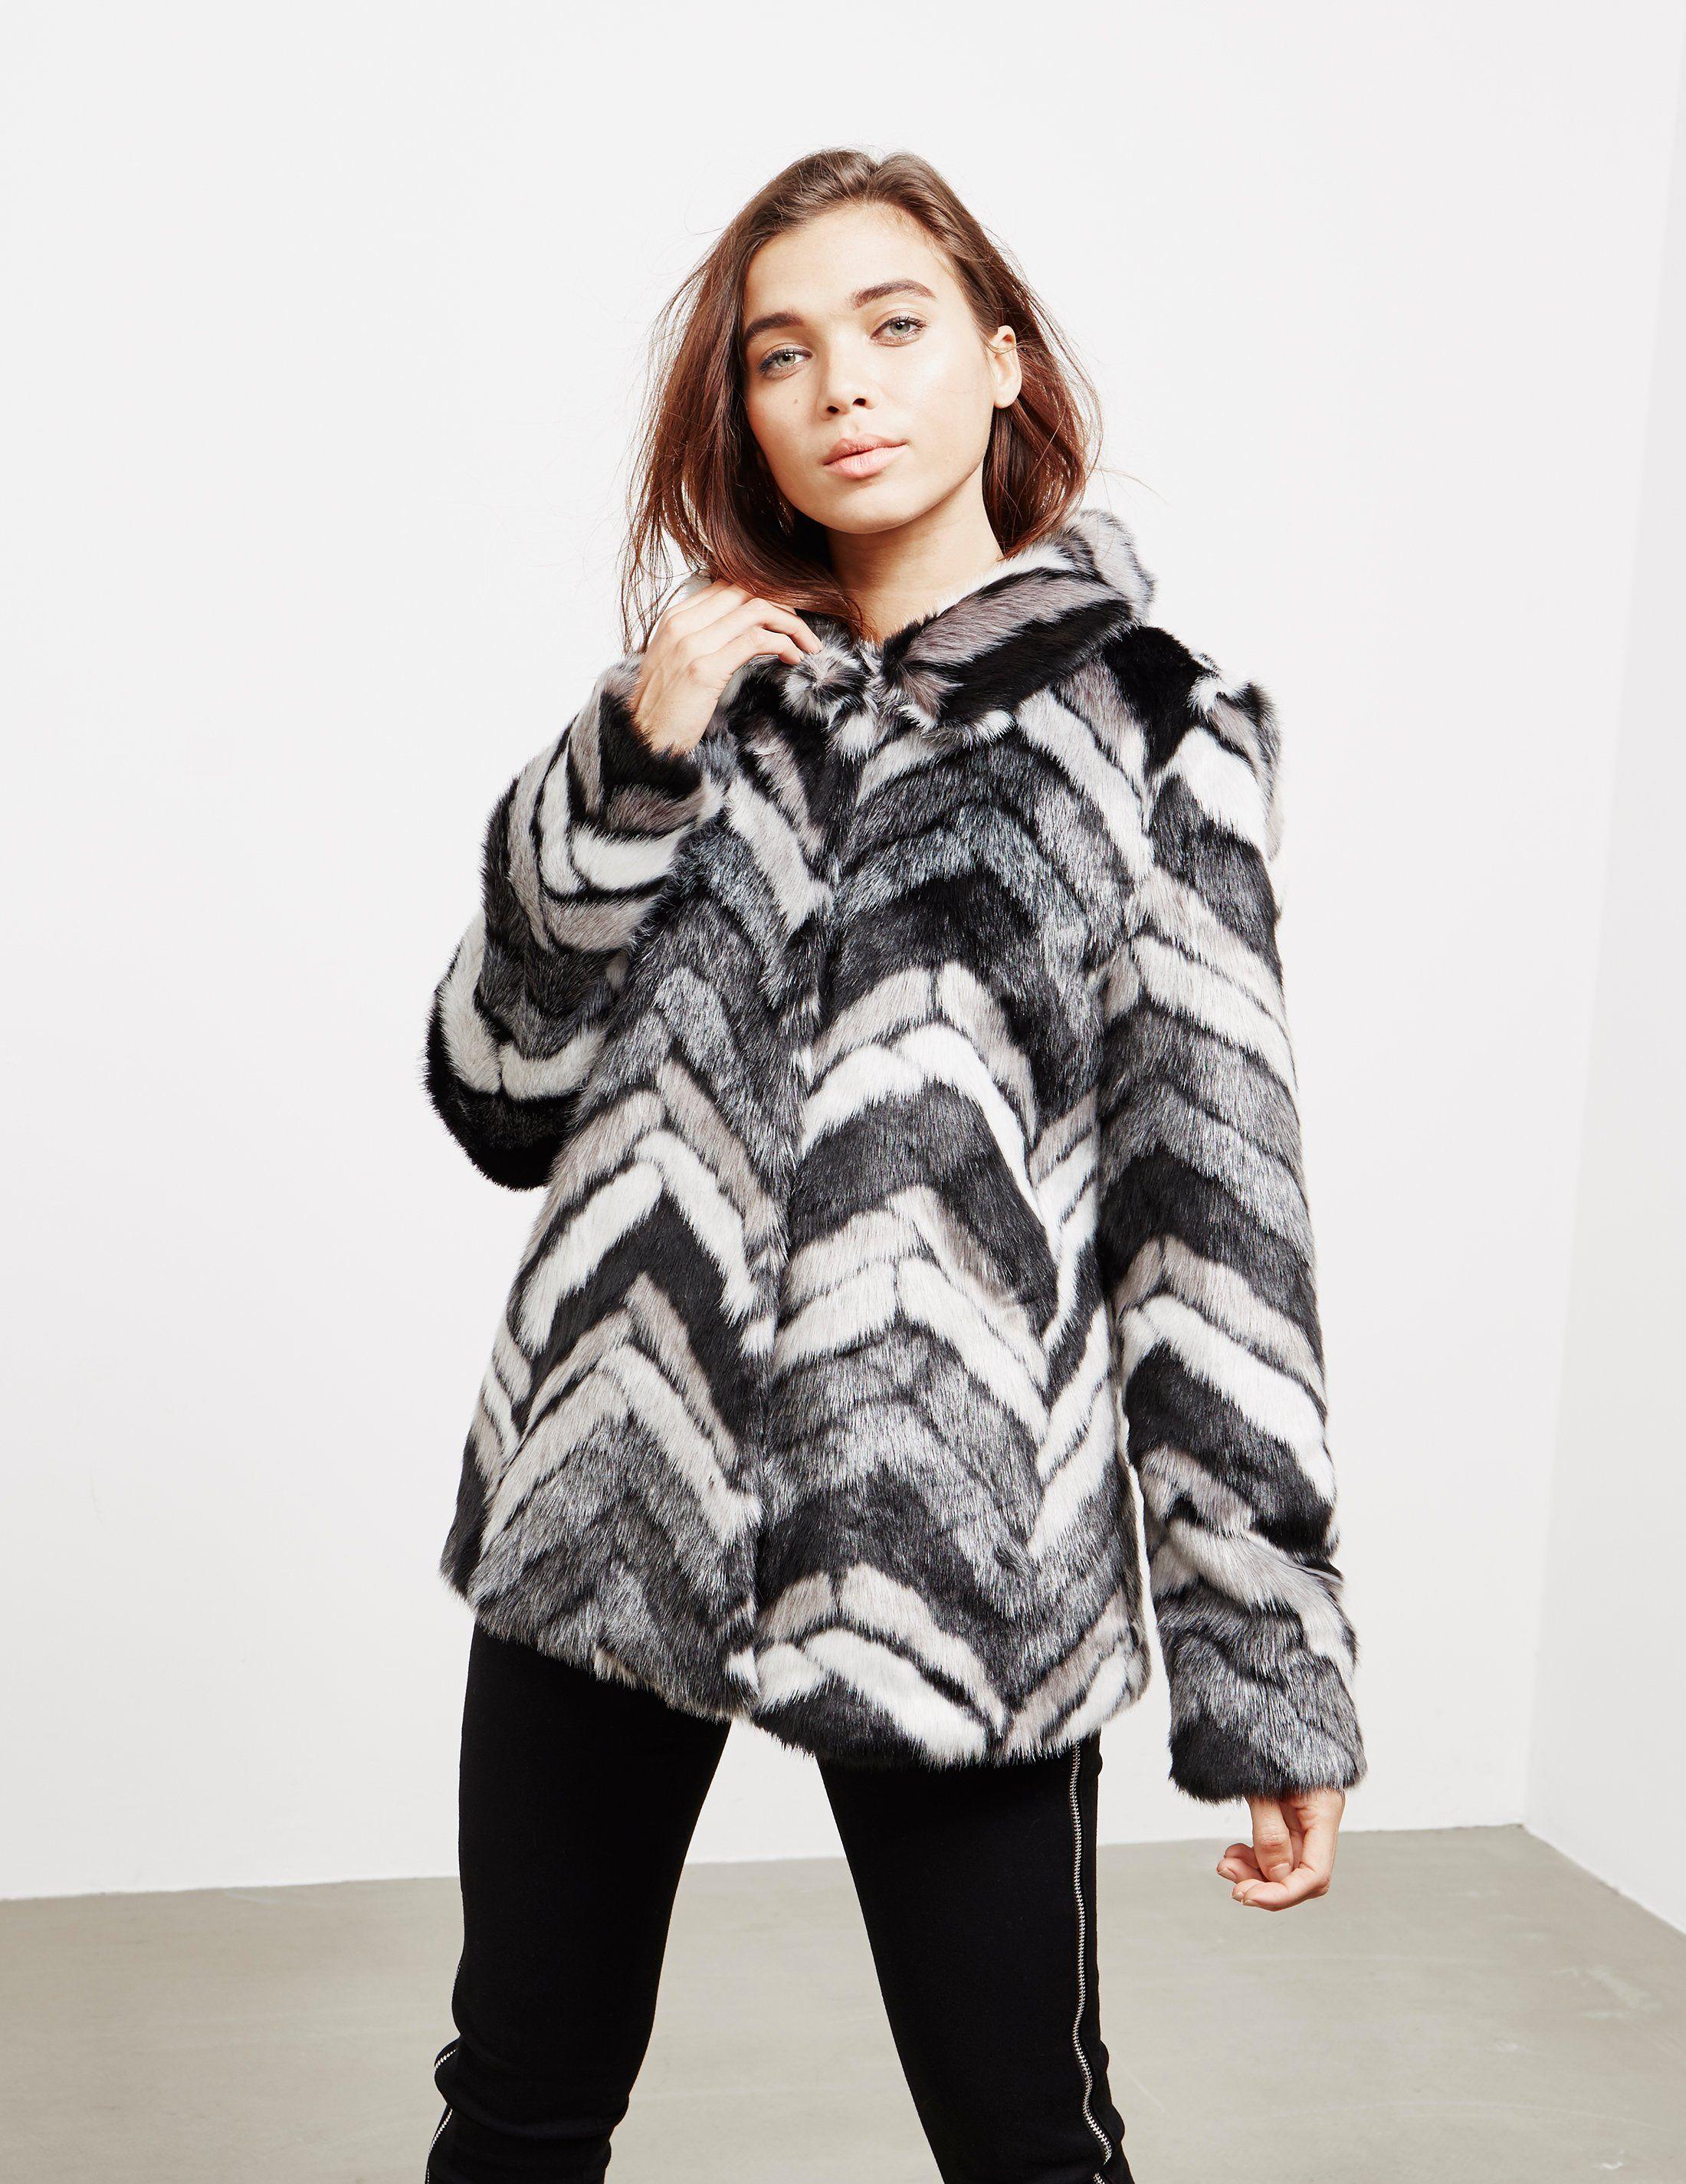 DKNY Faux Fur Jacket - Online Exclusive